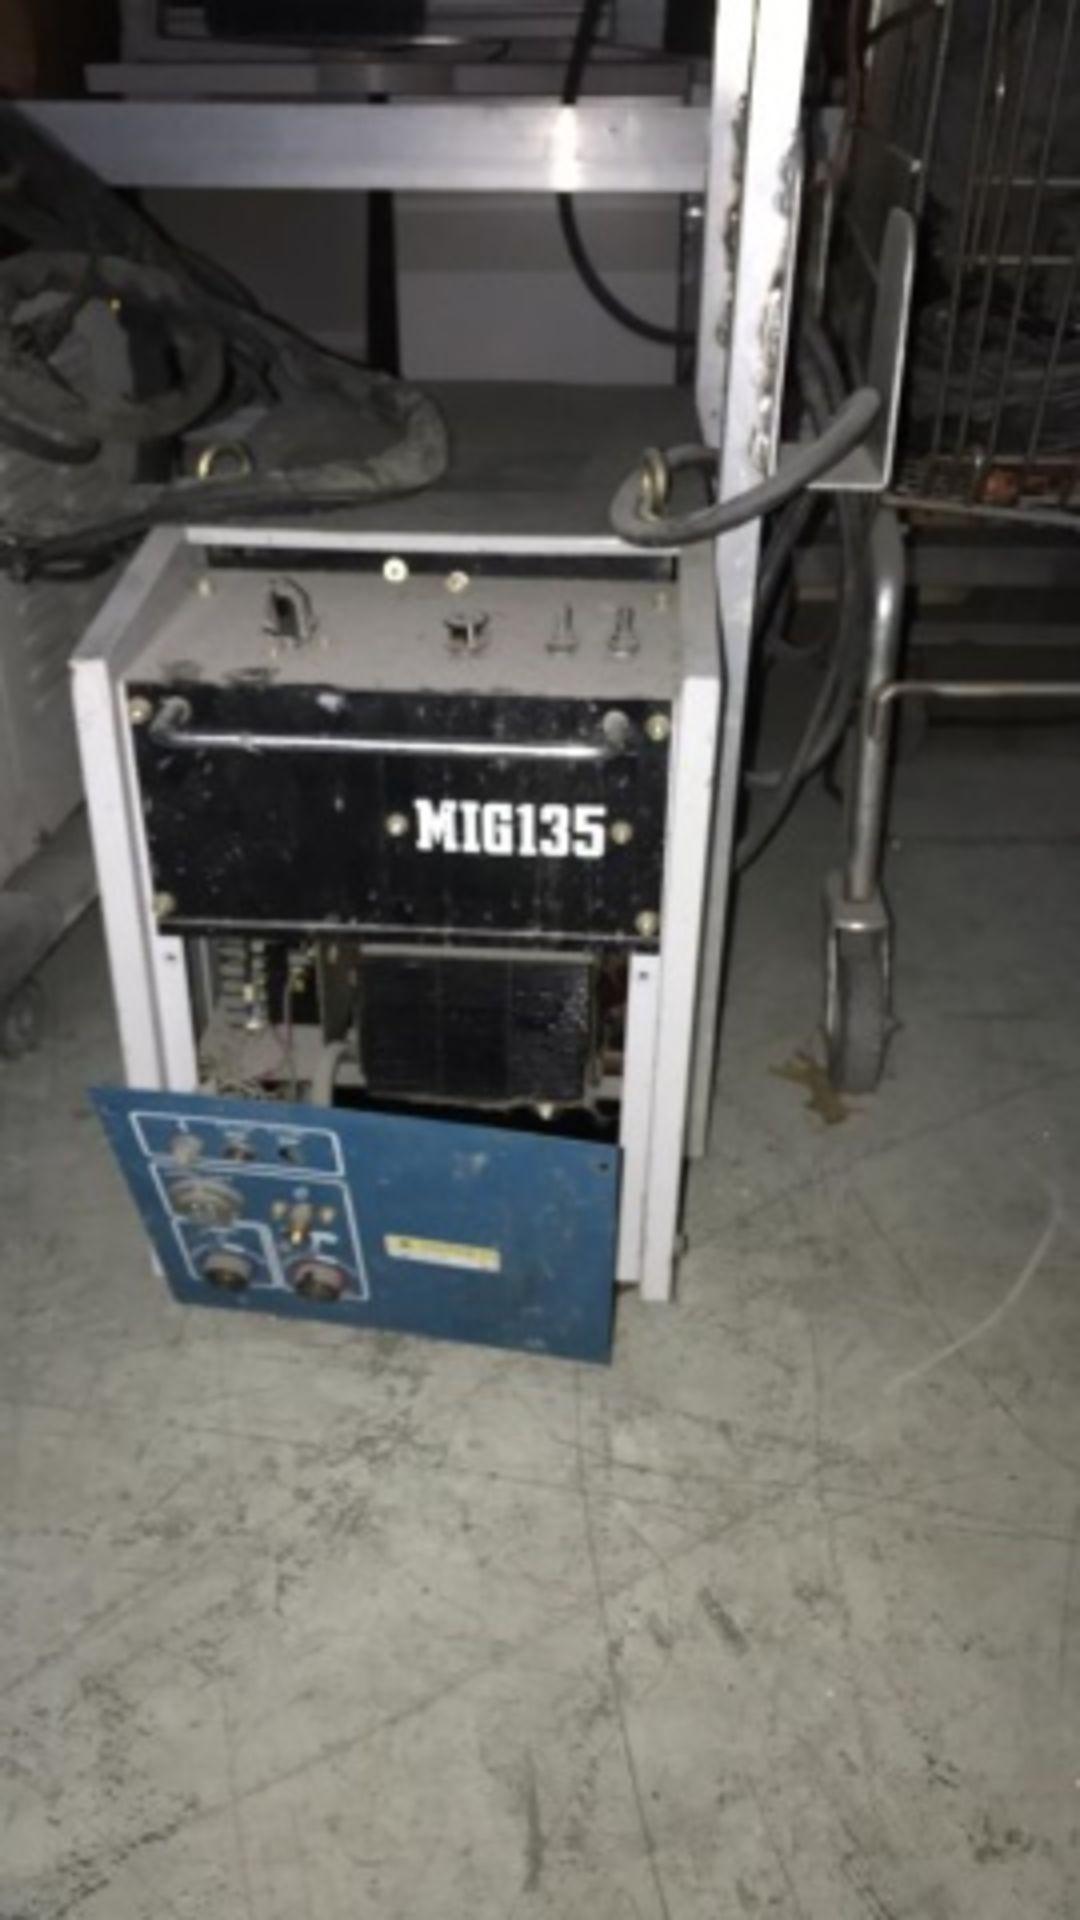 Daihen OTC Mig135 model CPSS-135 DC Power Source